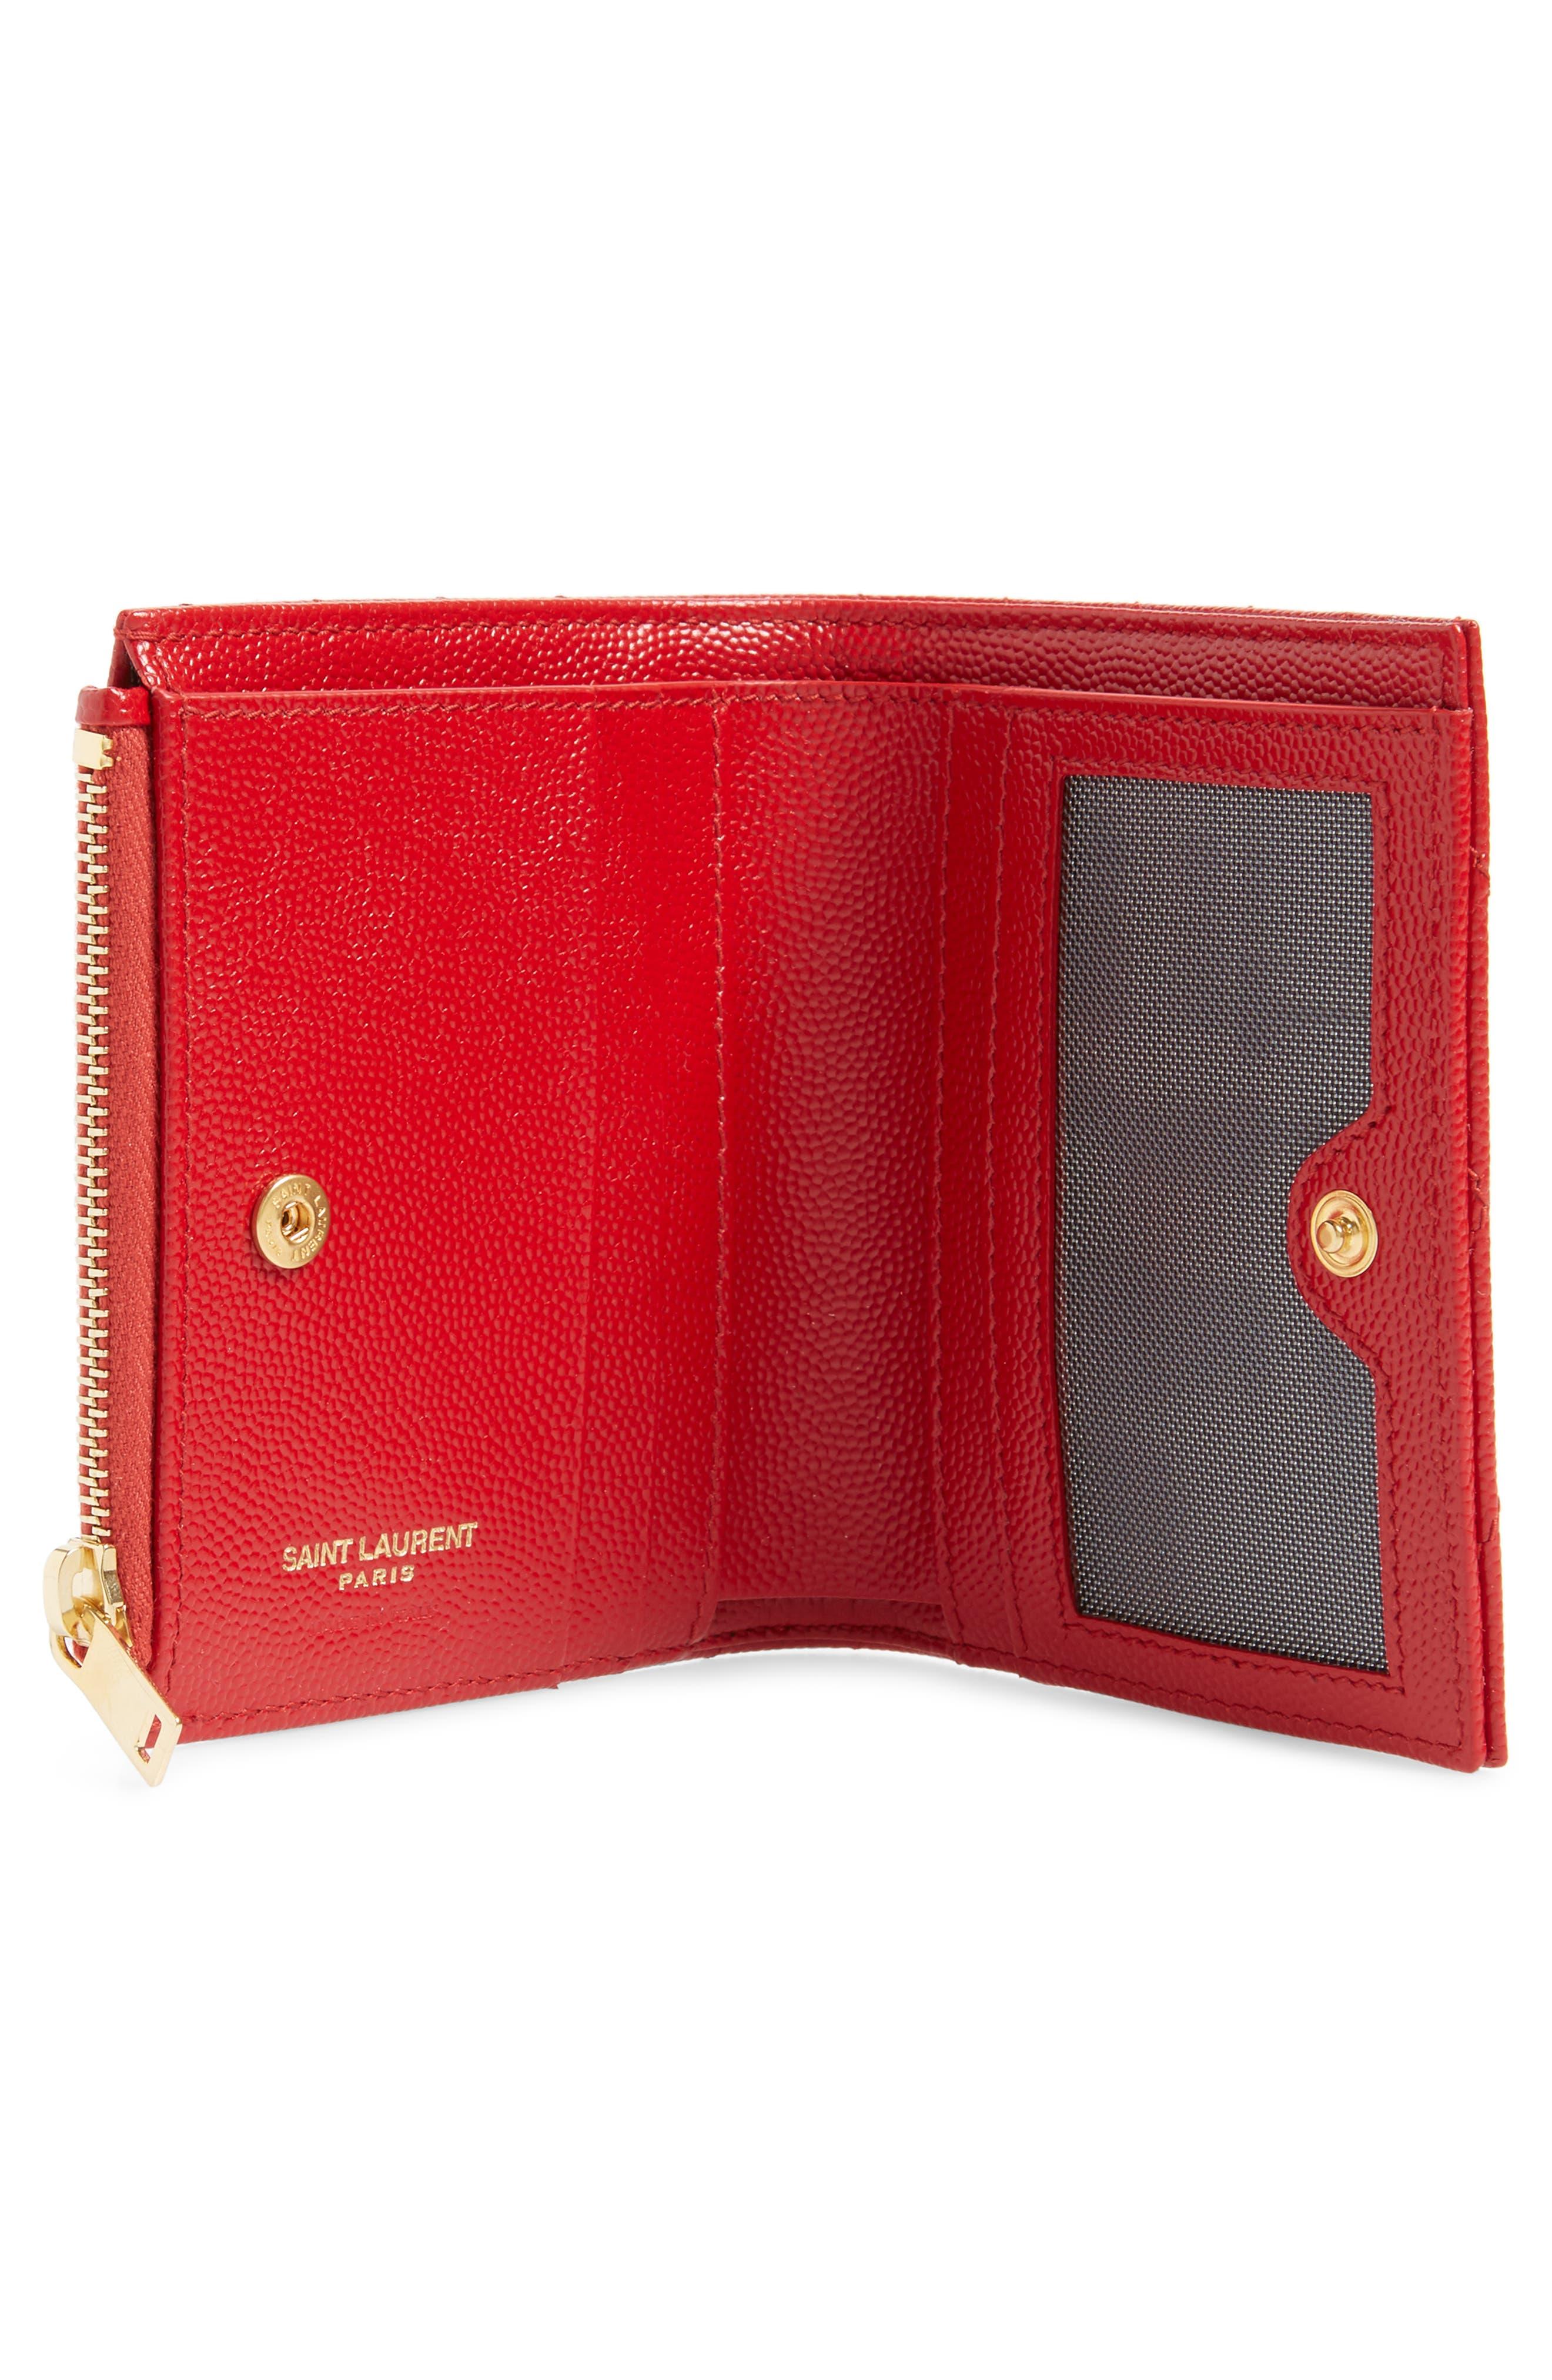 Monogram Leather Card Case,                             Alternate thumbnail 2, color,                             BANDANA RED